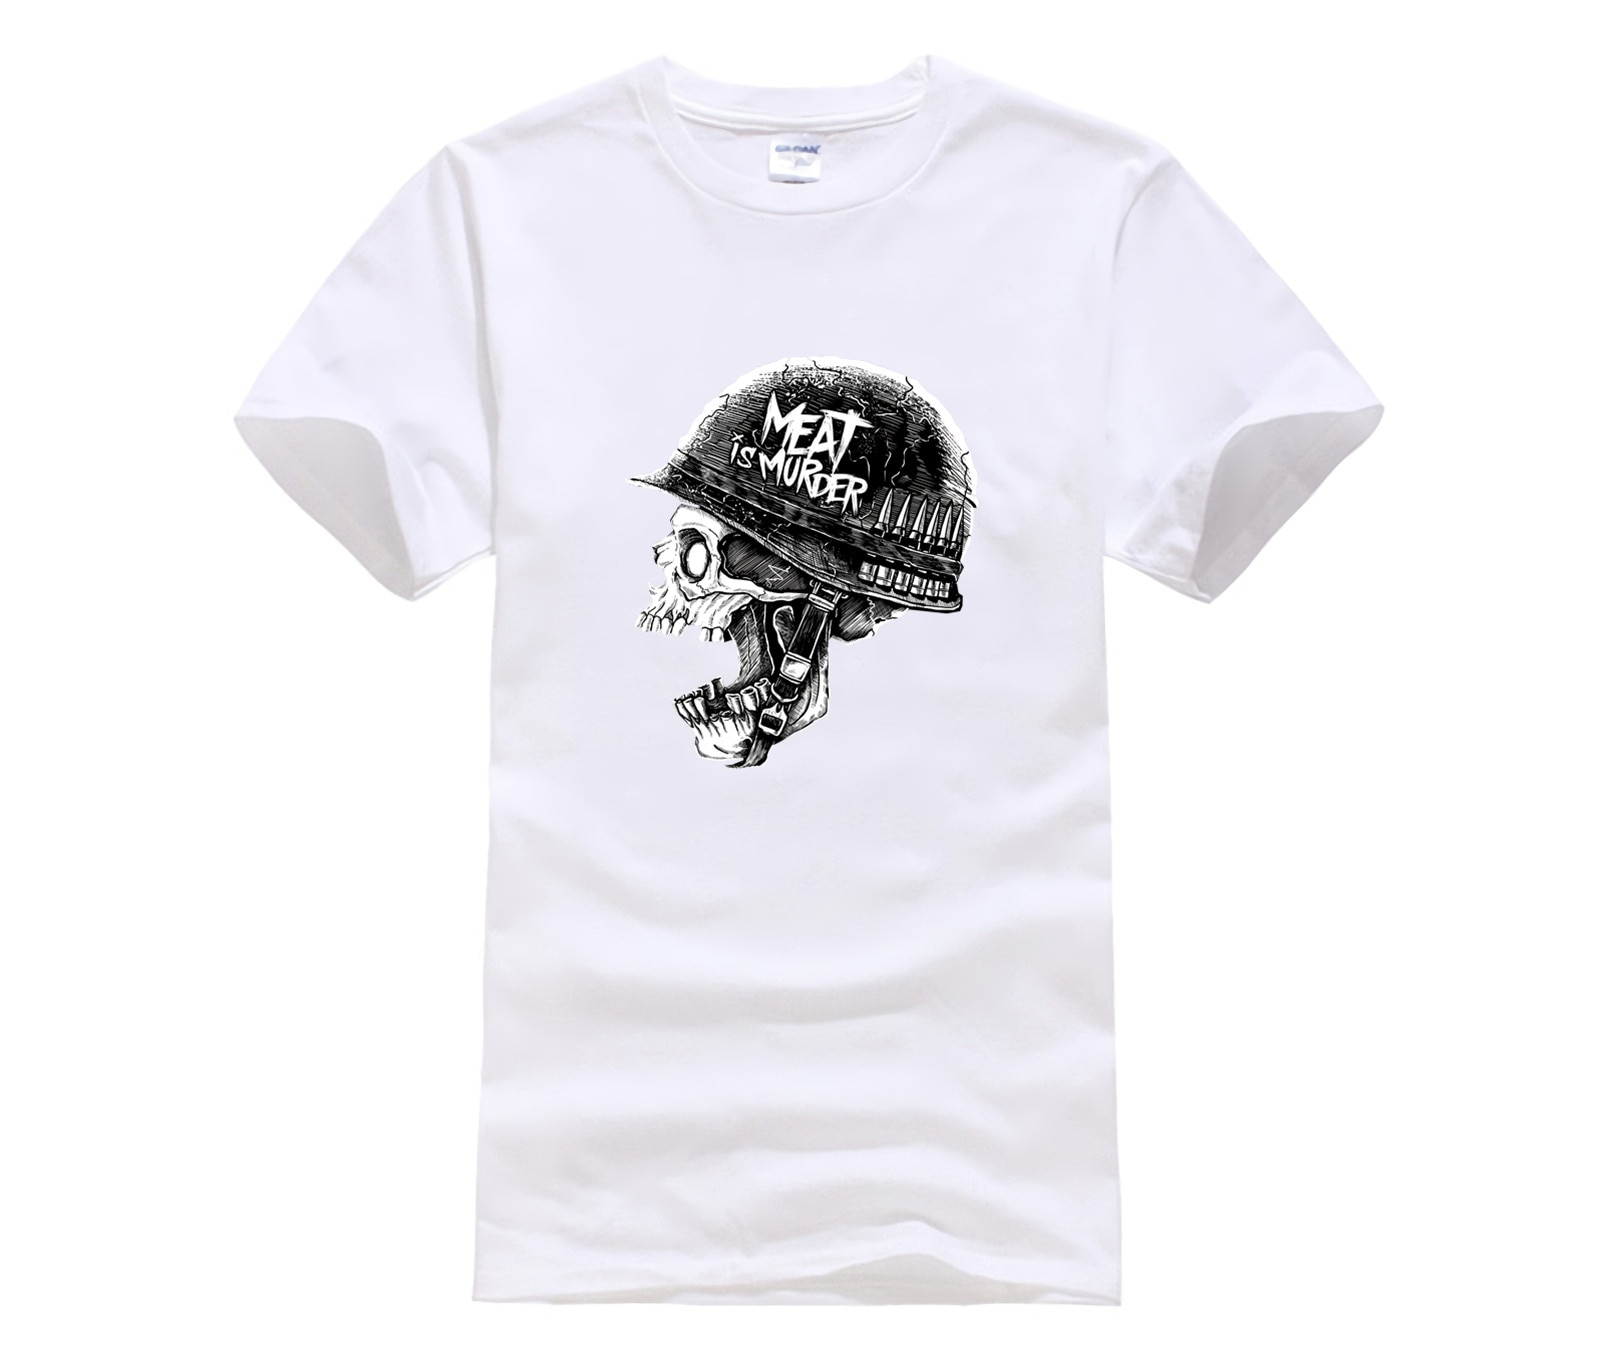 Moda casual masculina t camisa em torno do pescoço legal velocitee erkek et cinayet ordu kafatas mal l askeri kollu nova tshirt